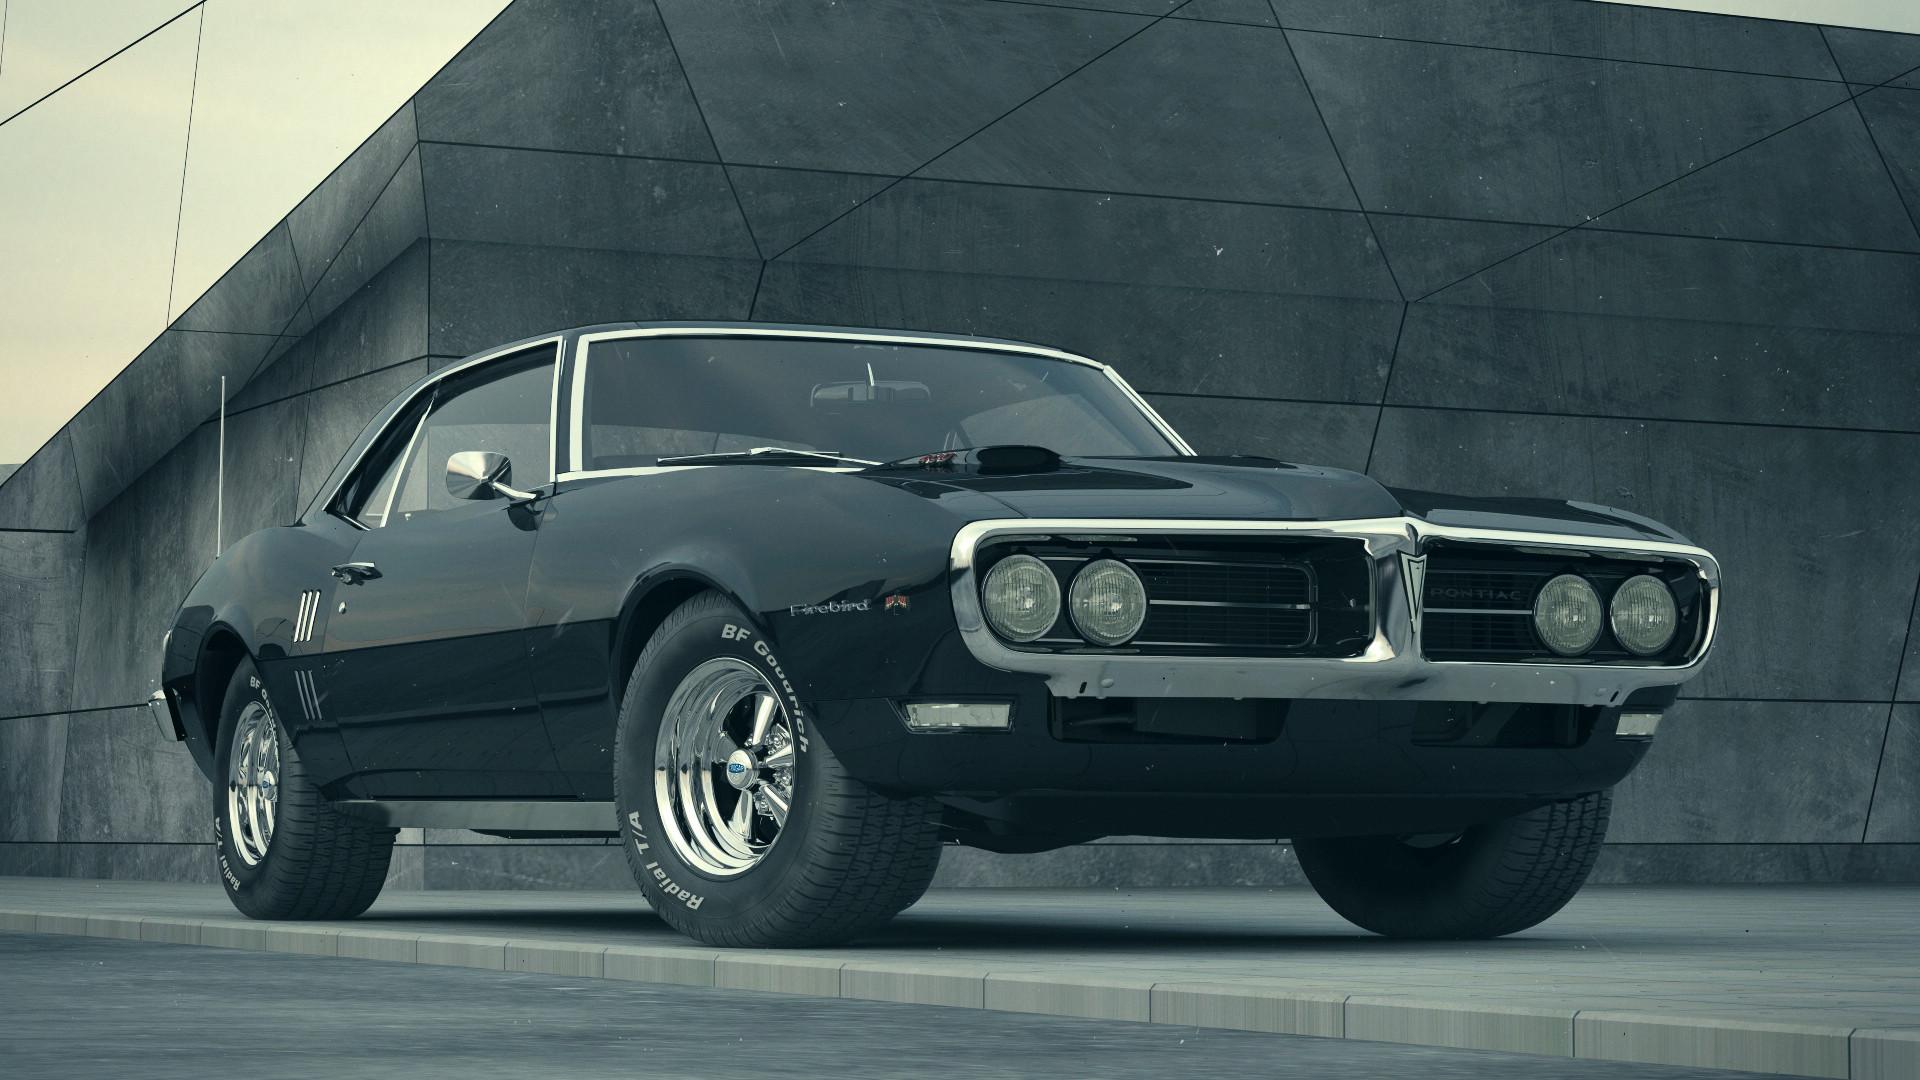 1970 Pontiac Gto Wallpaper